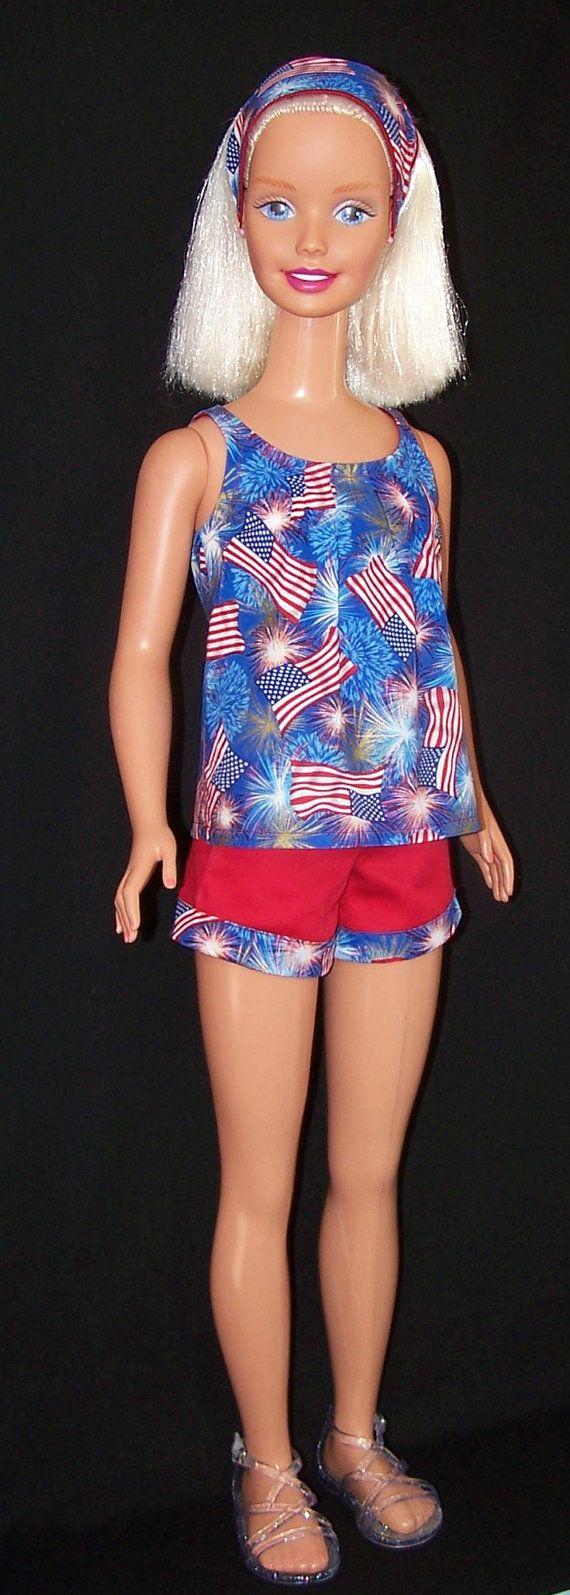 My Size Barbie Doll American Flag Top & Shorts Set by SewDollyCute - $18 - https://www.etsy.com/shop/sewdollycute